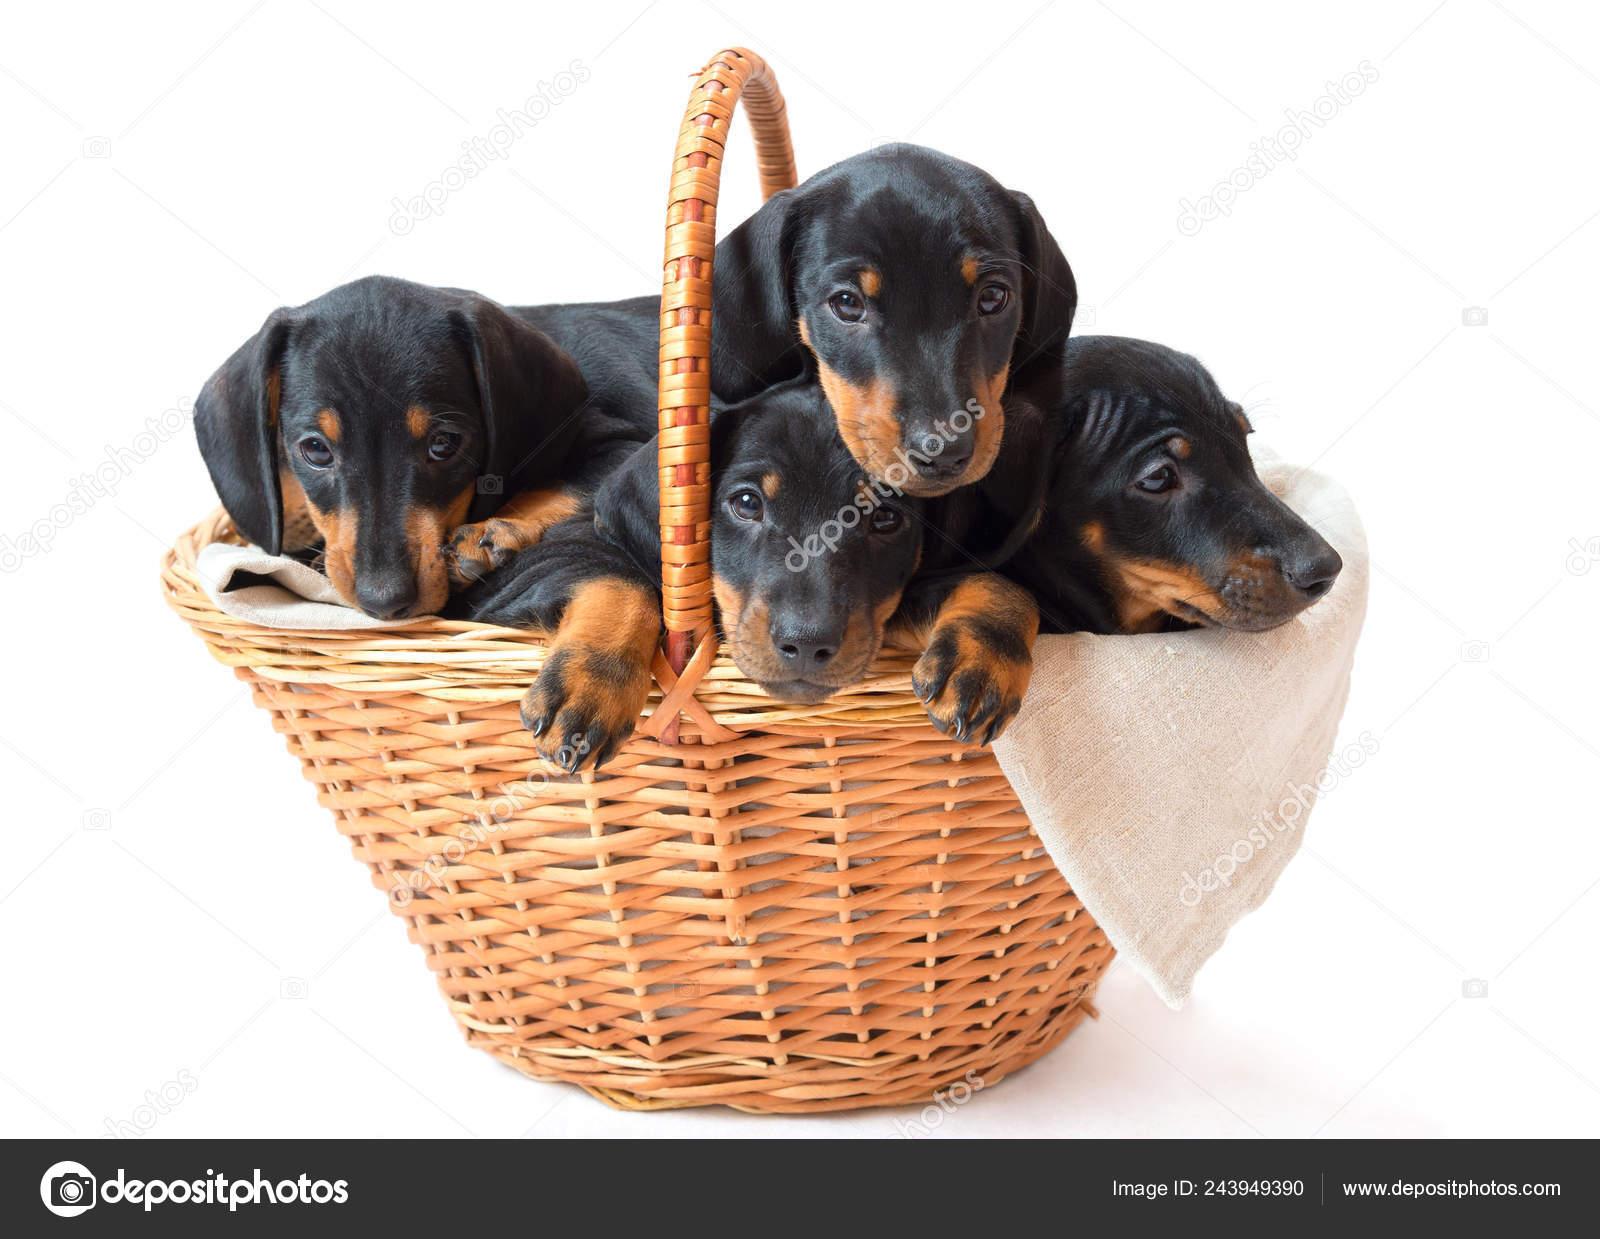 Five Two Month Smooth Black Tan Dachshund Puppies Basket Stock Photo C Antmos 243949390